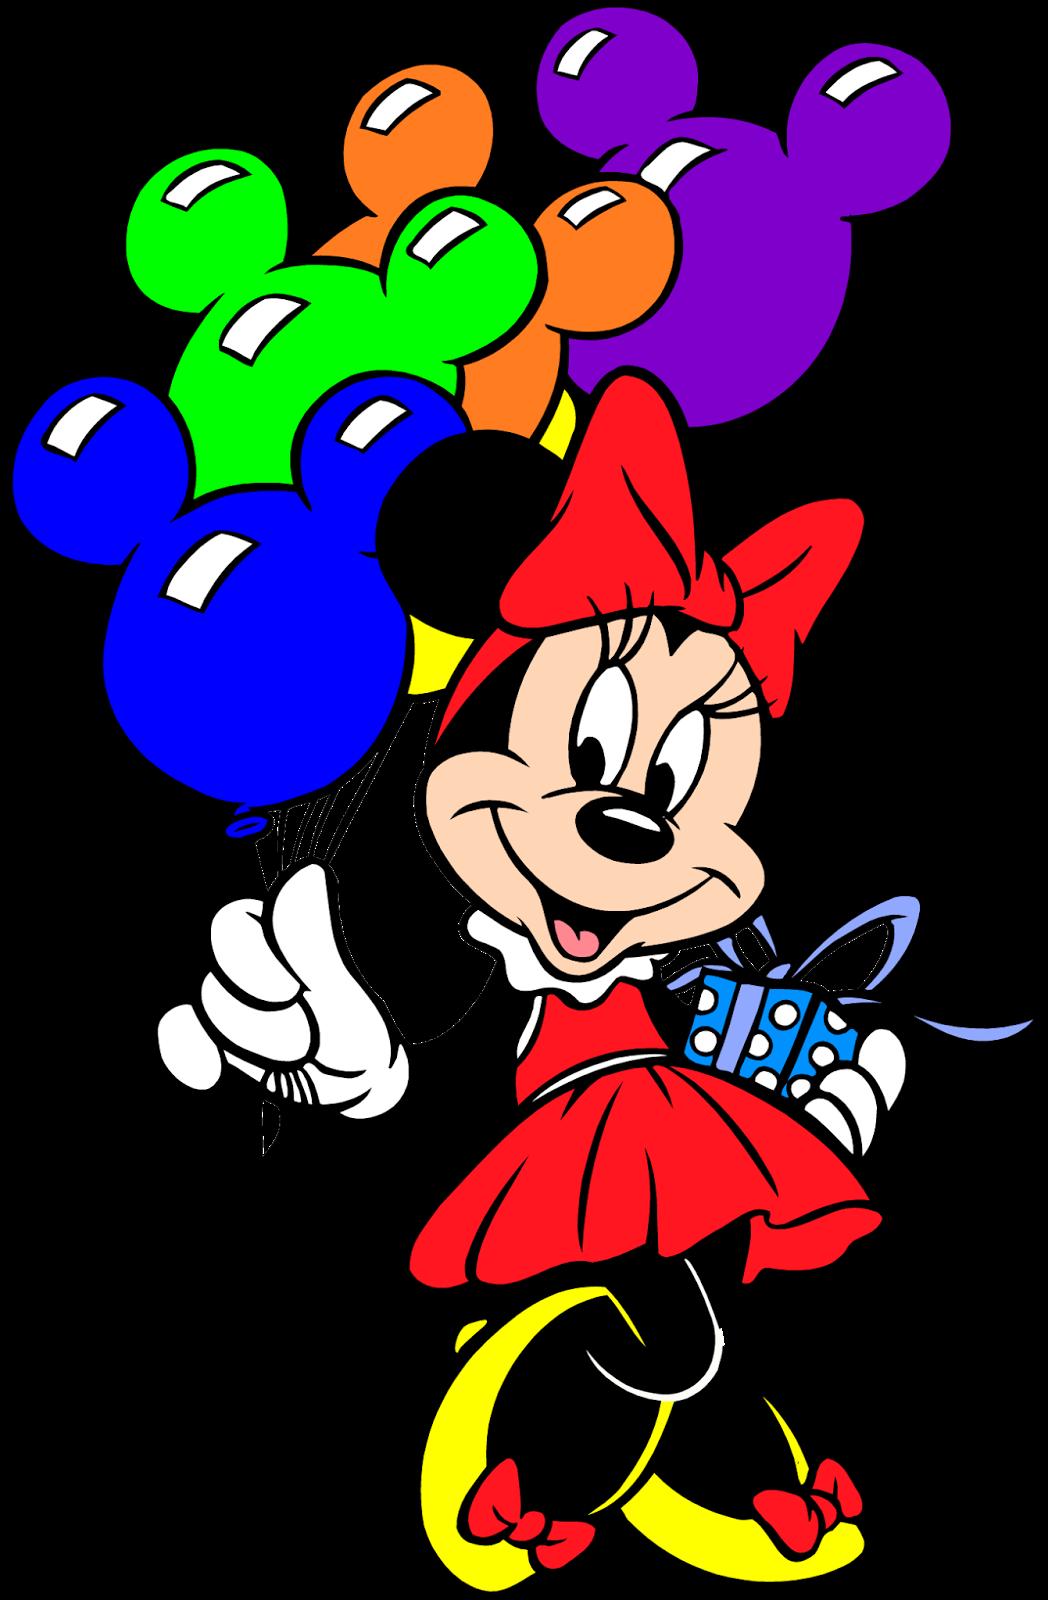 clipart disney happy birthday - photo #26